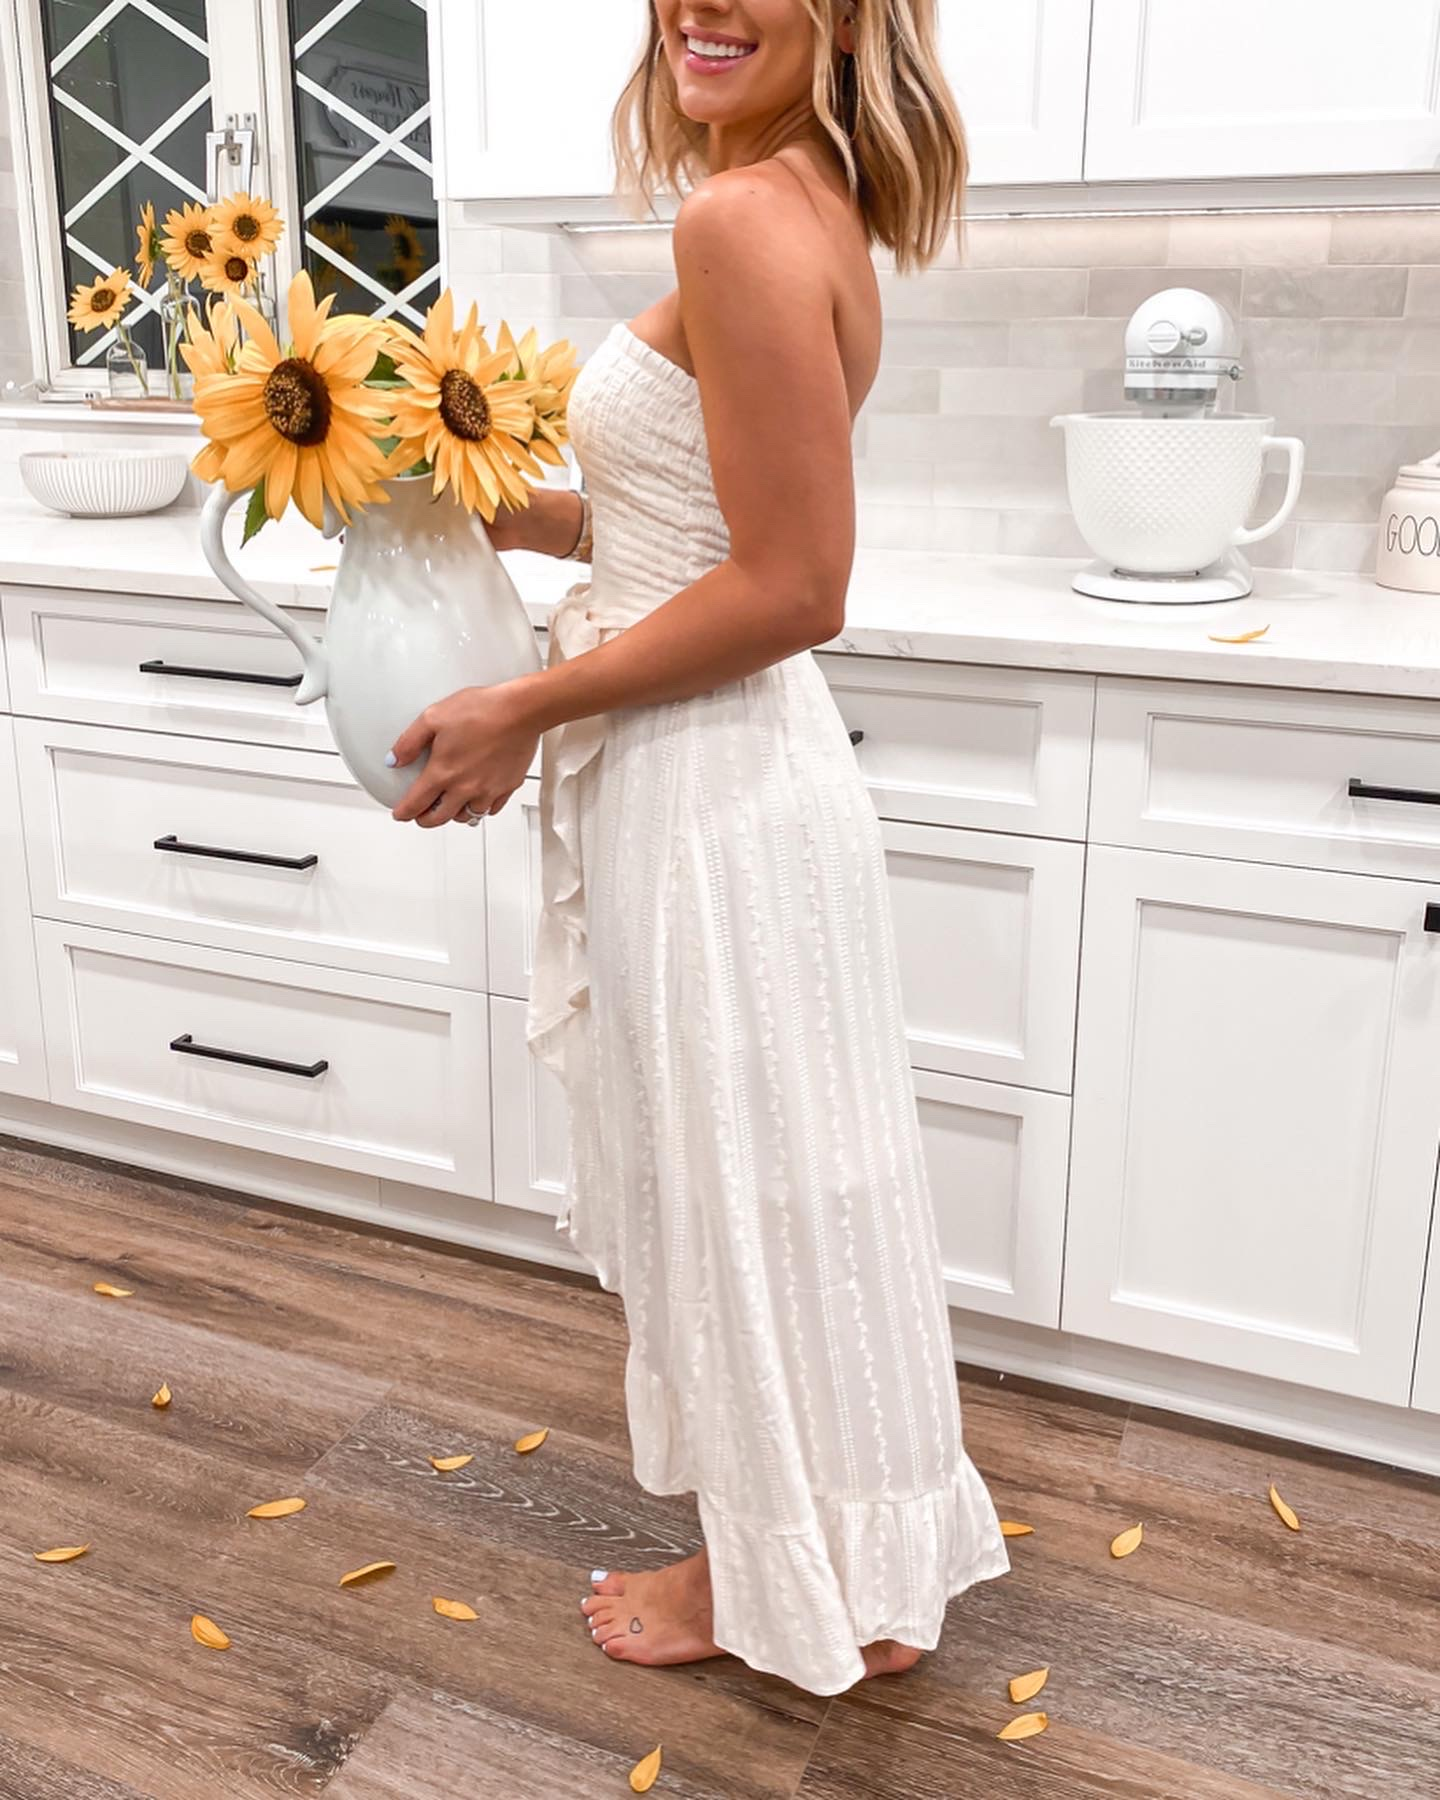 Laura beverlin white midi maxi dress spring farmhouse sunflowers kitchen express1